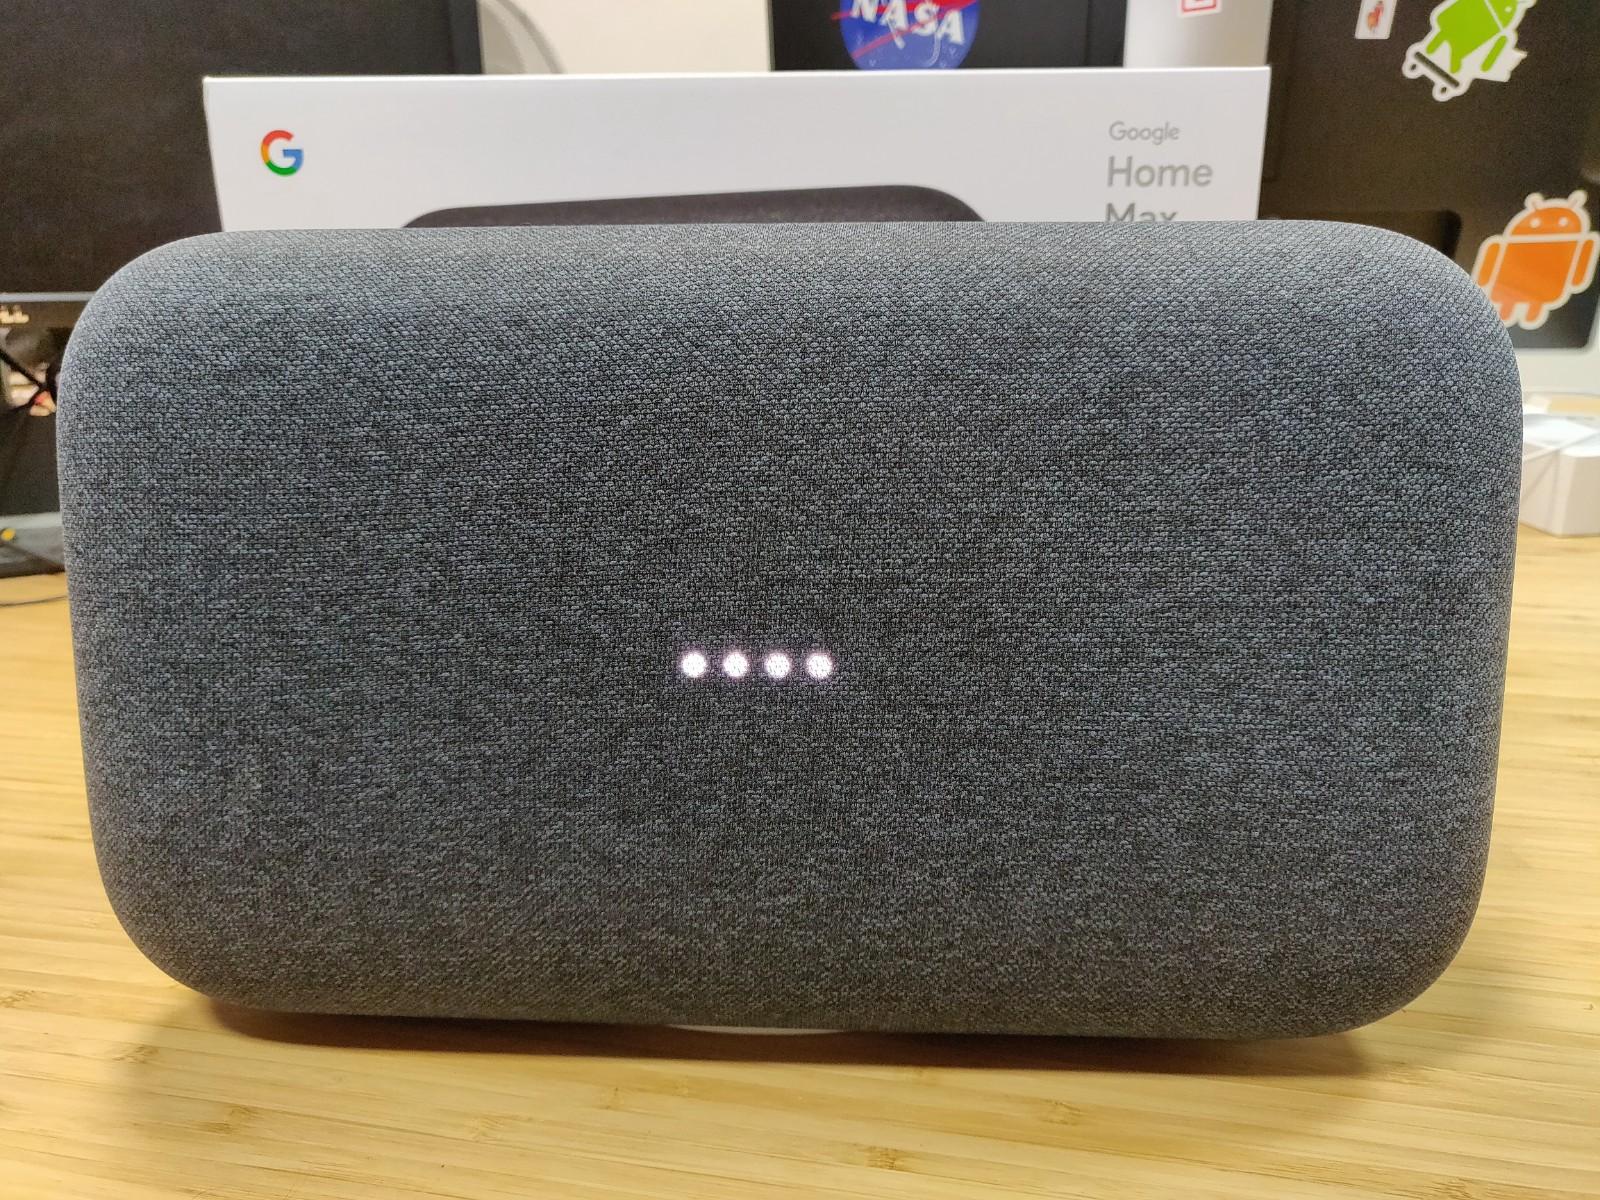 google home max nos premi res impressions sur la grosse enceinte intelligente frandroid. Black Bedroom Furniture Sets. Home Design Ideas